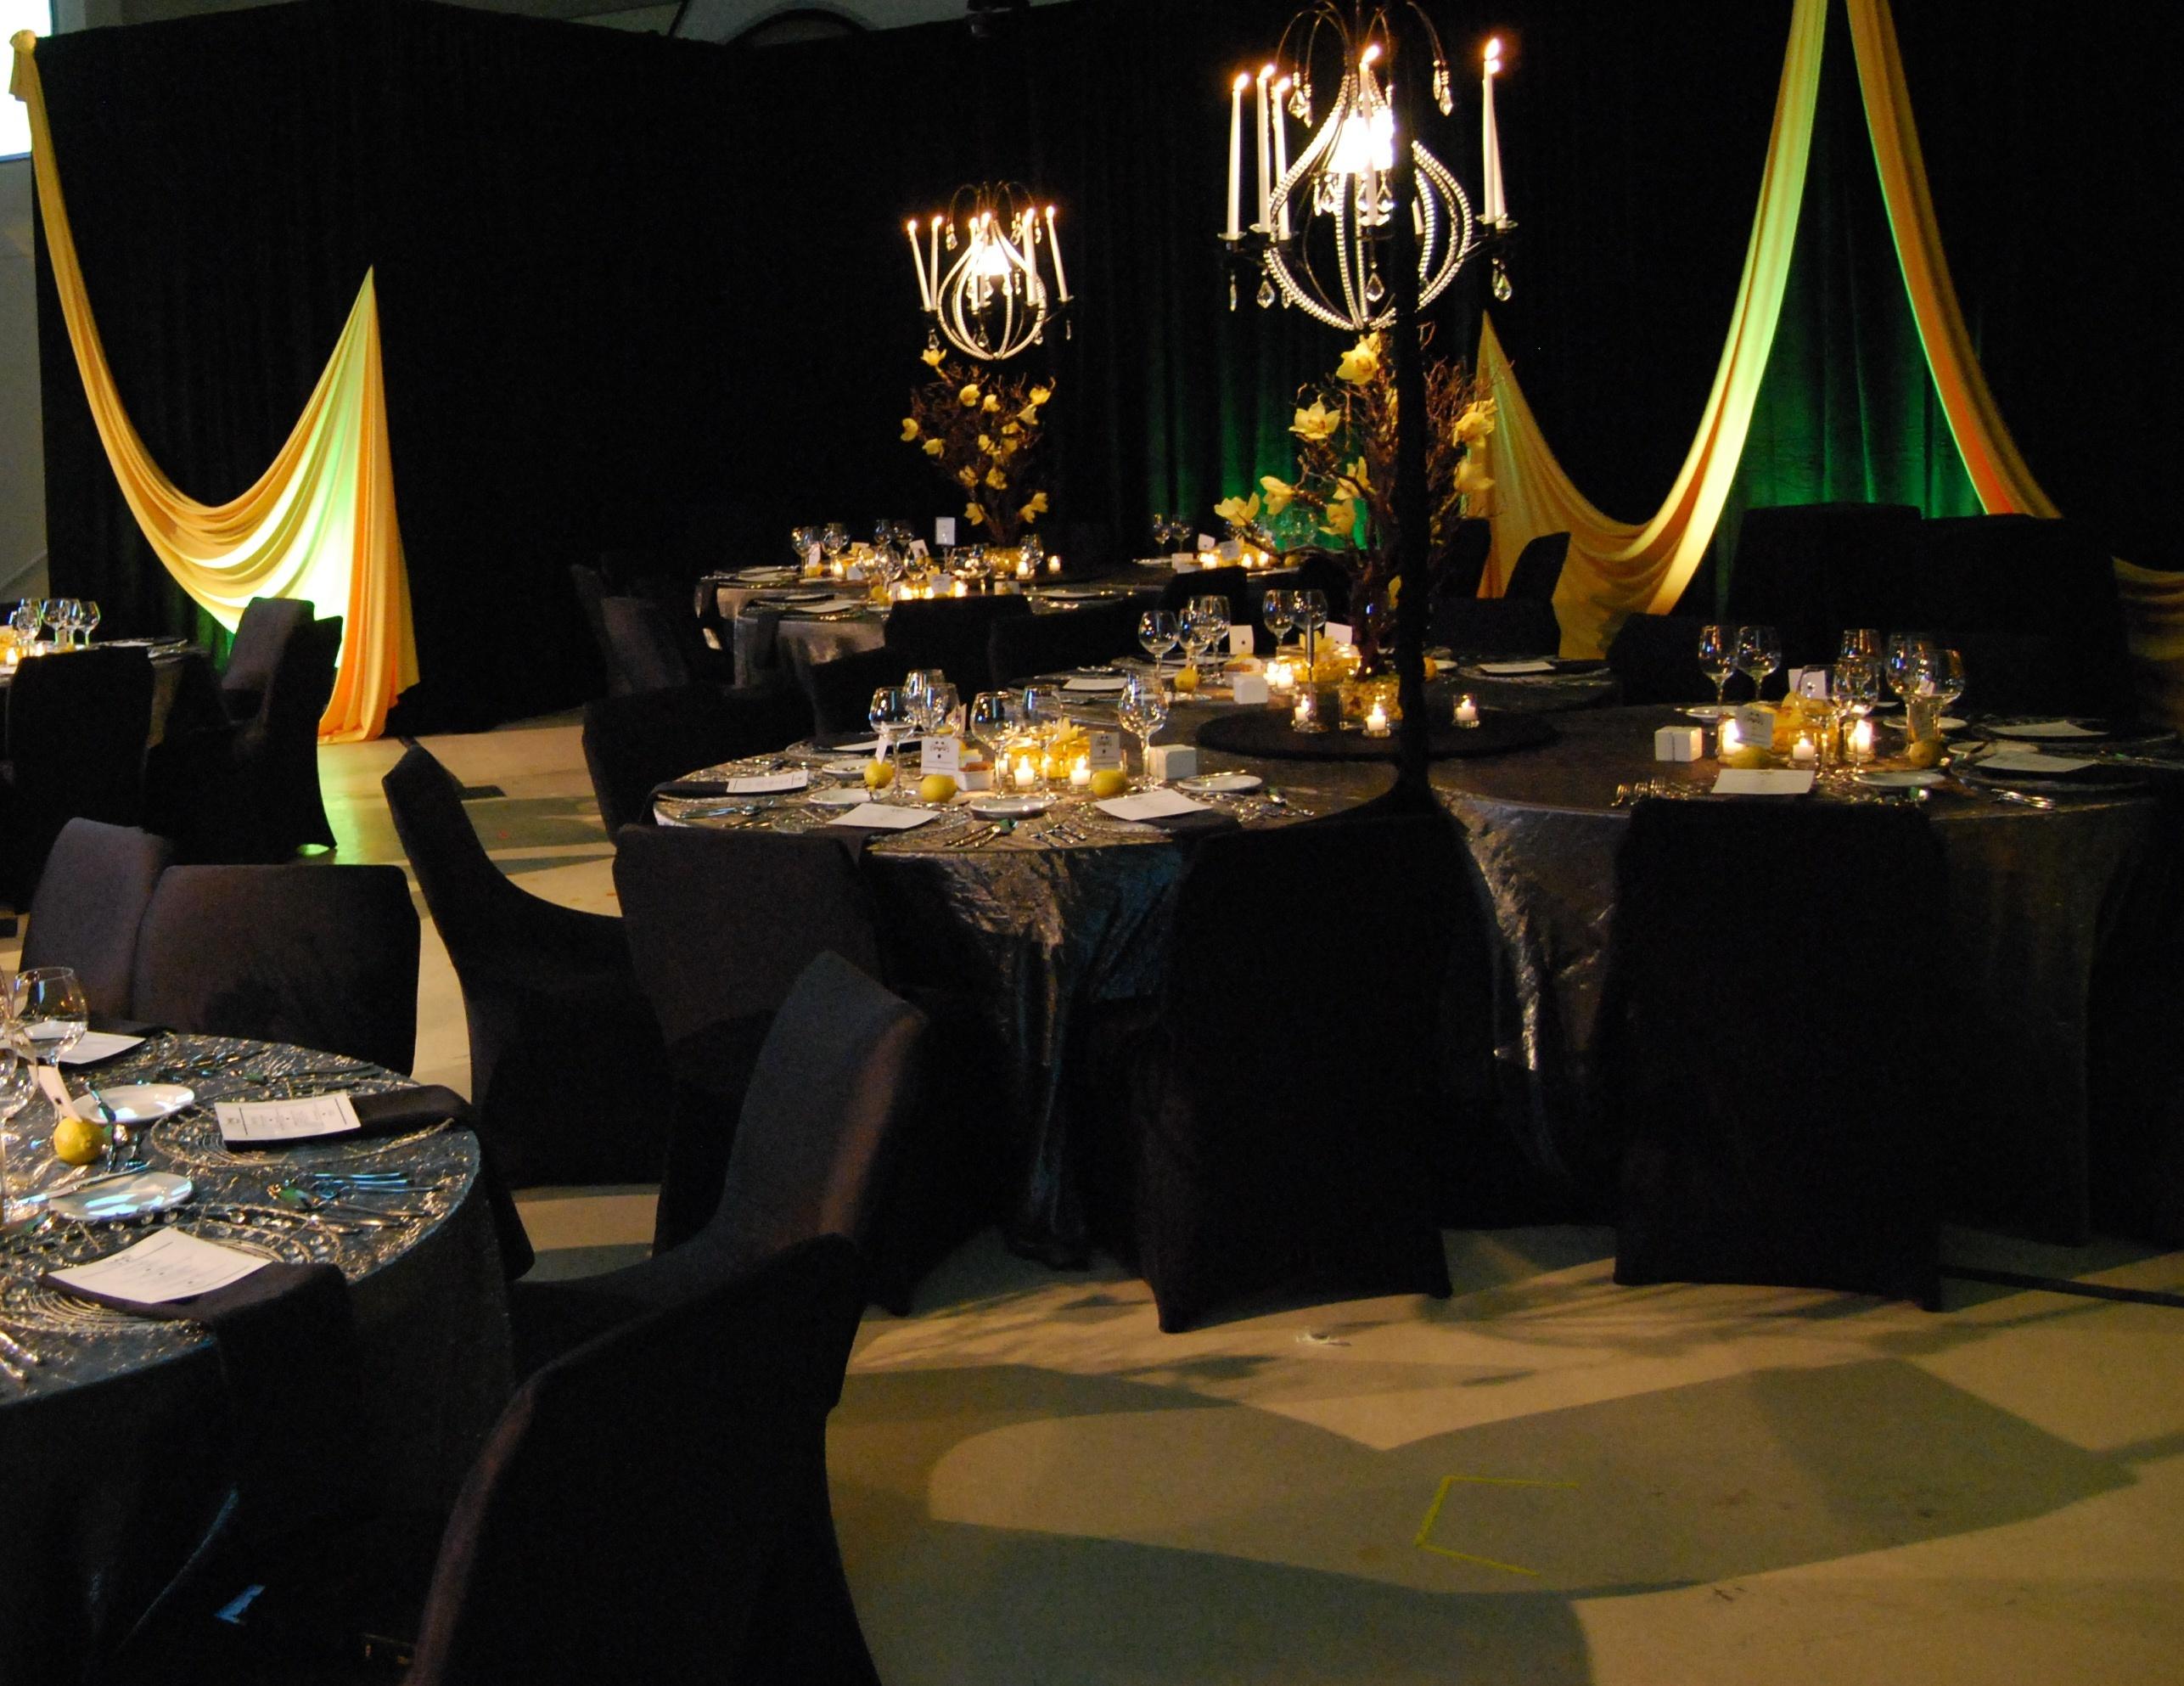 Gold And Black Wedding Ideas: Elegant Dinner Settingvendors Markei Events Amp